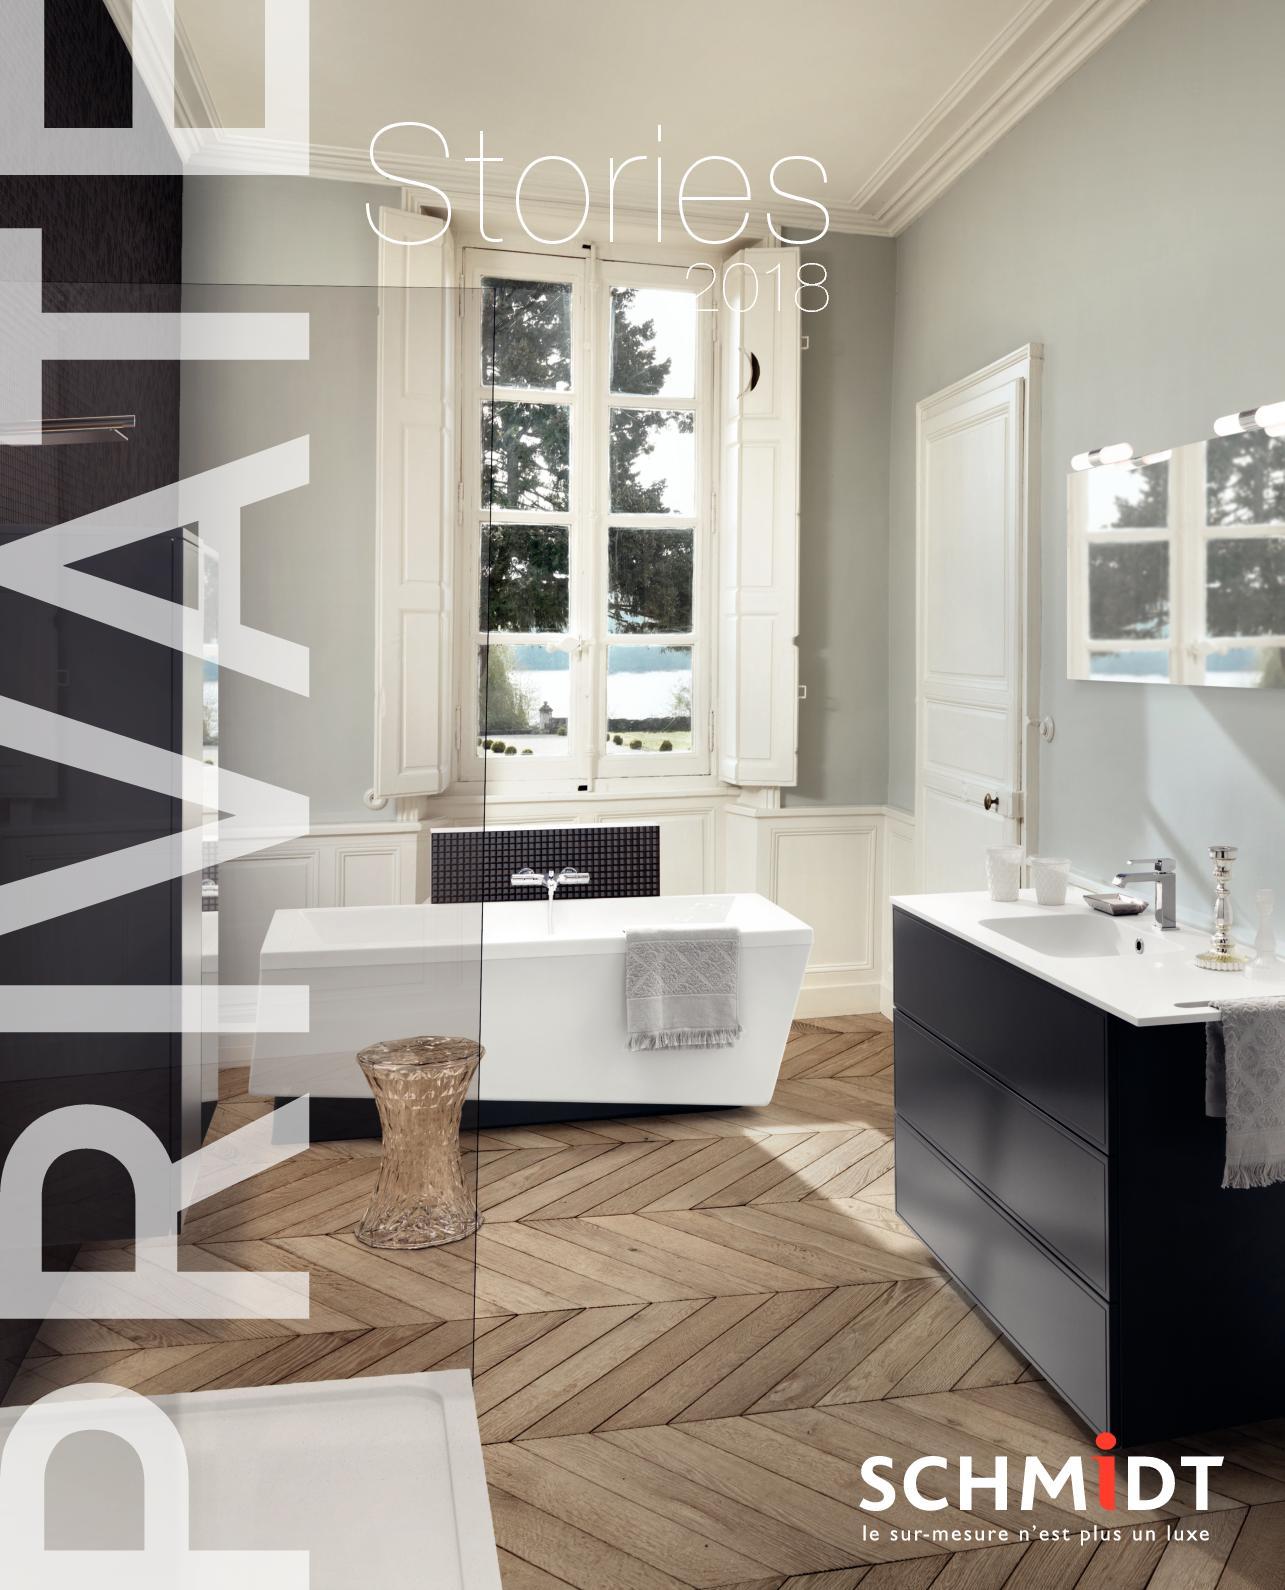 calam o catalogue salle de bains schmidt 2018. Black Bedroom Furniture Sets. Home Design Ideas